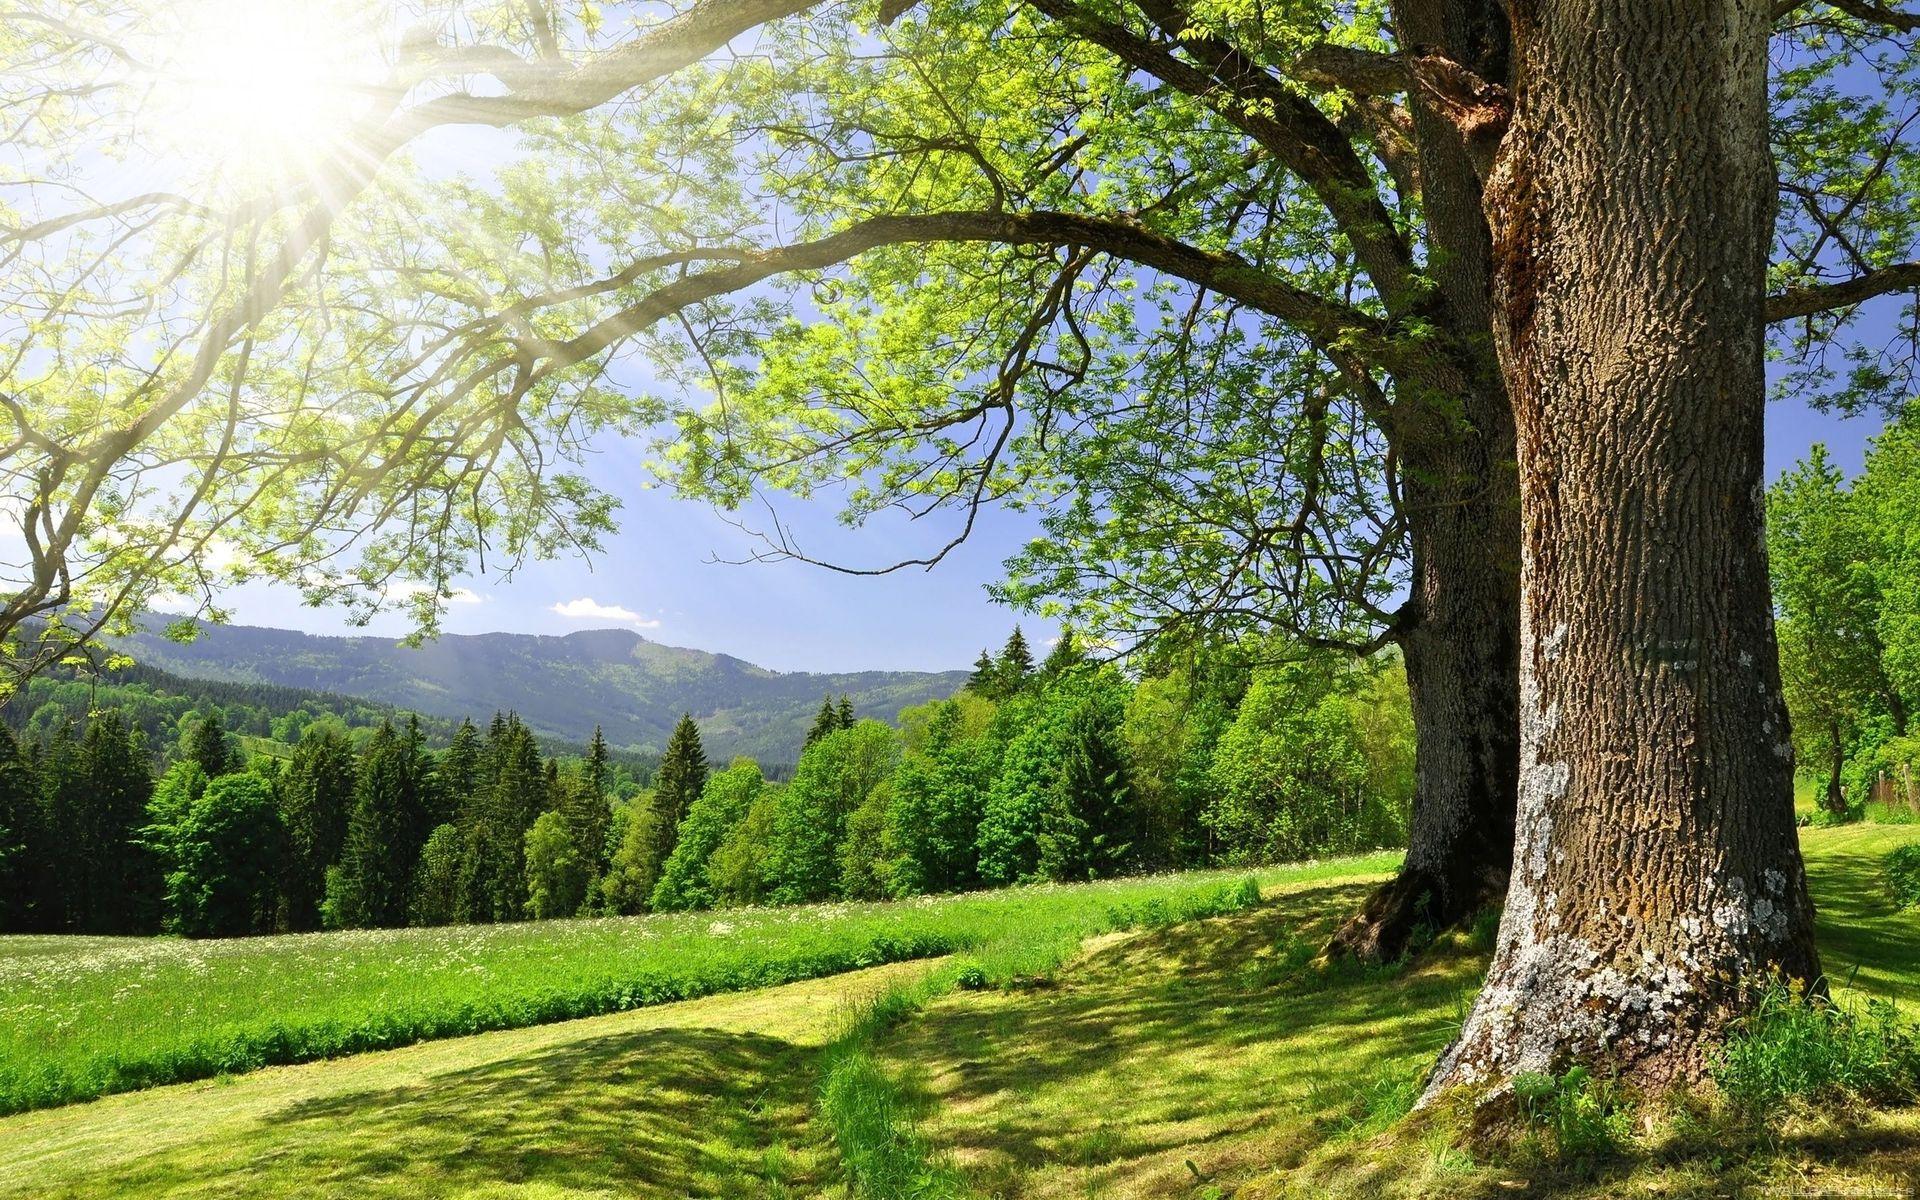 fond d'ecran gratuit nature